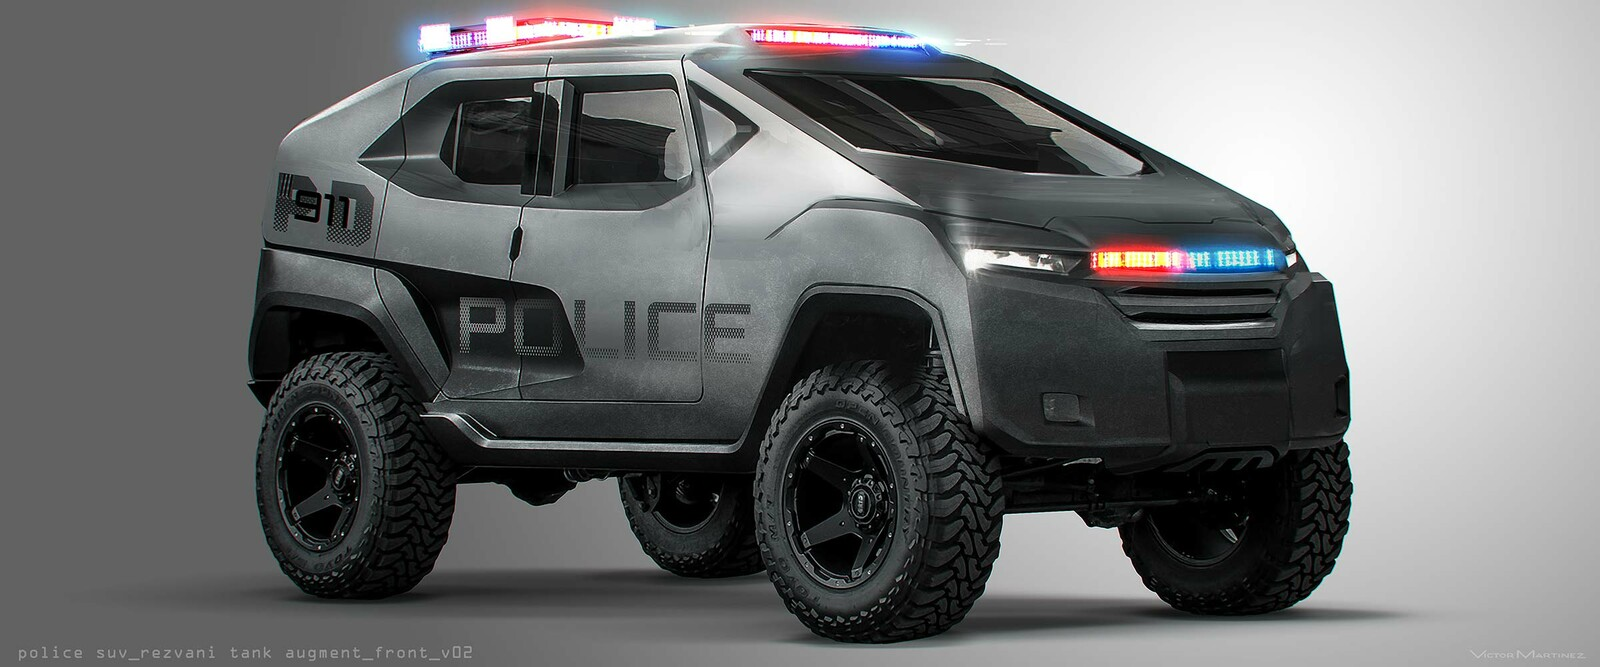 Westworld Police SUV - designed by Victor Martinez